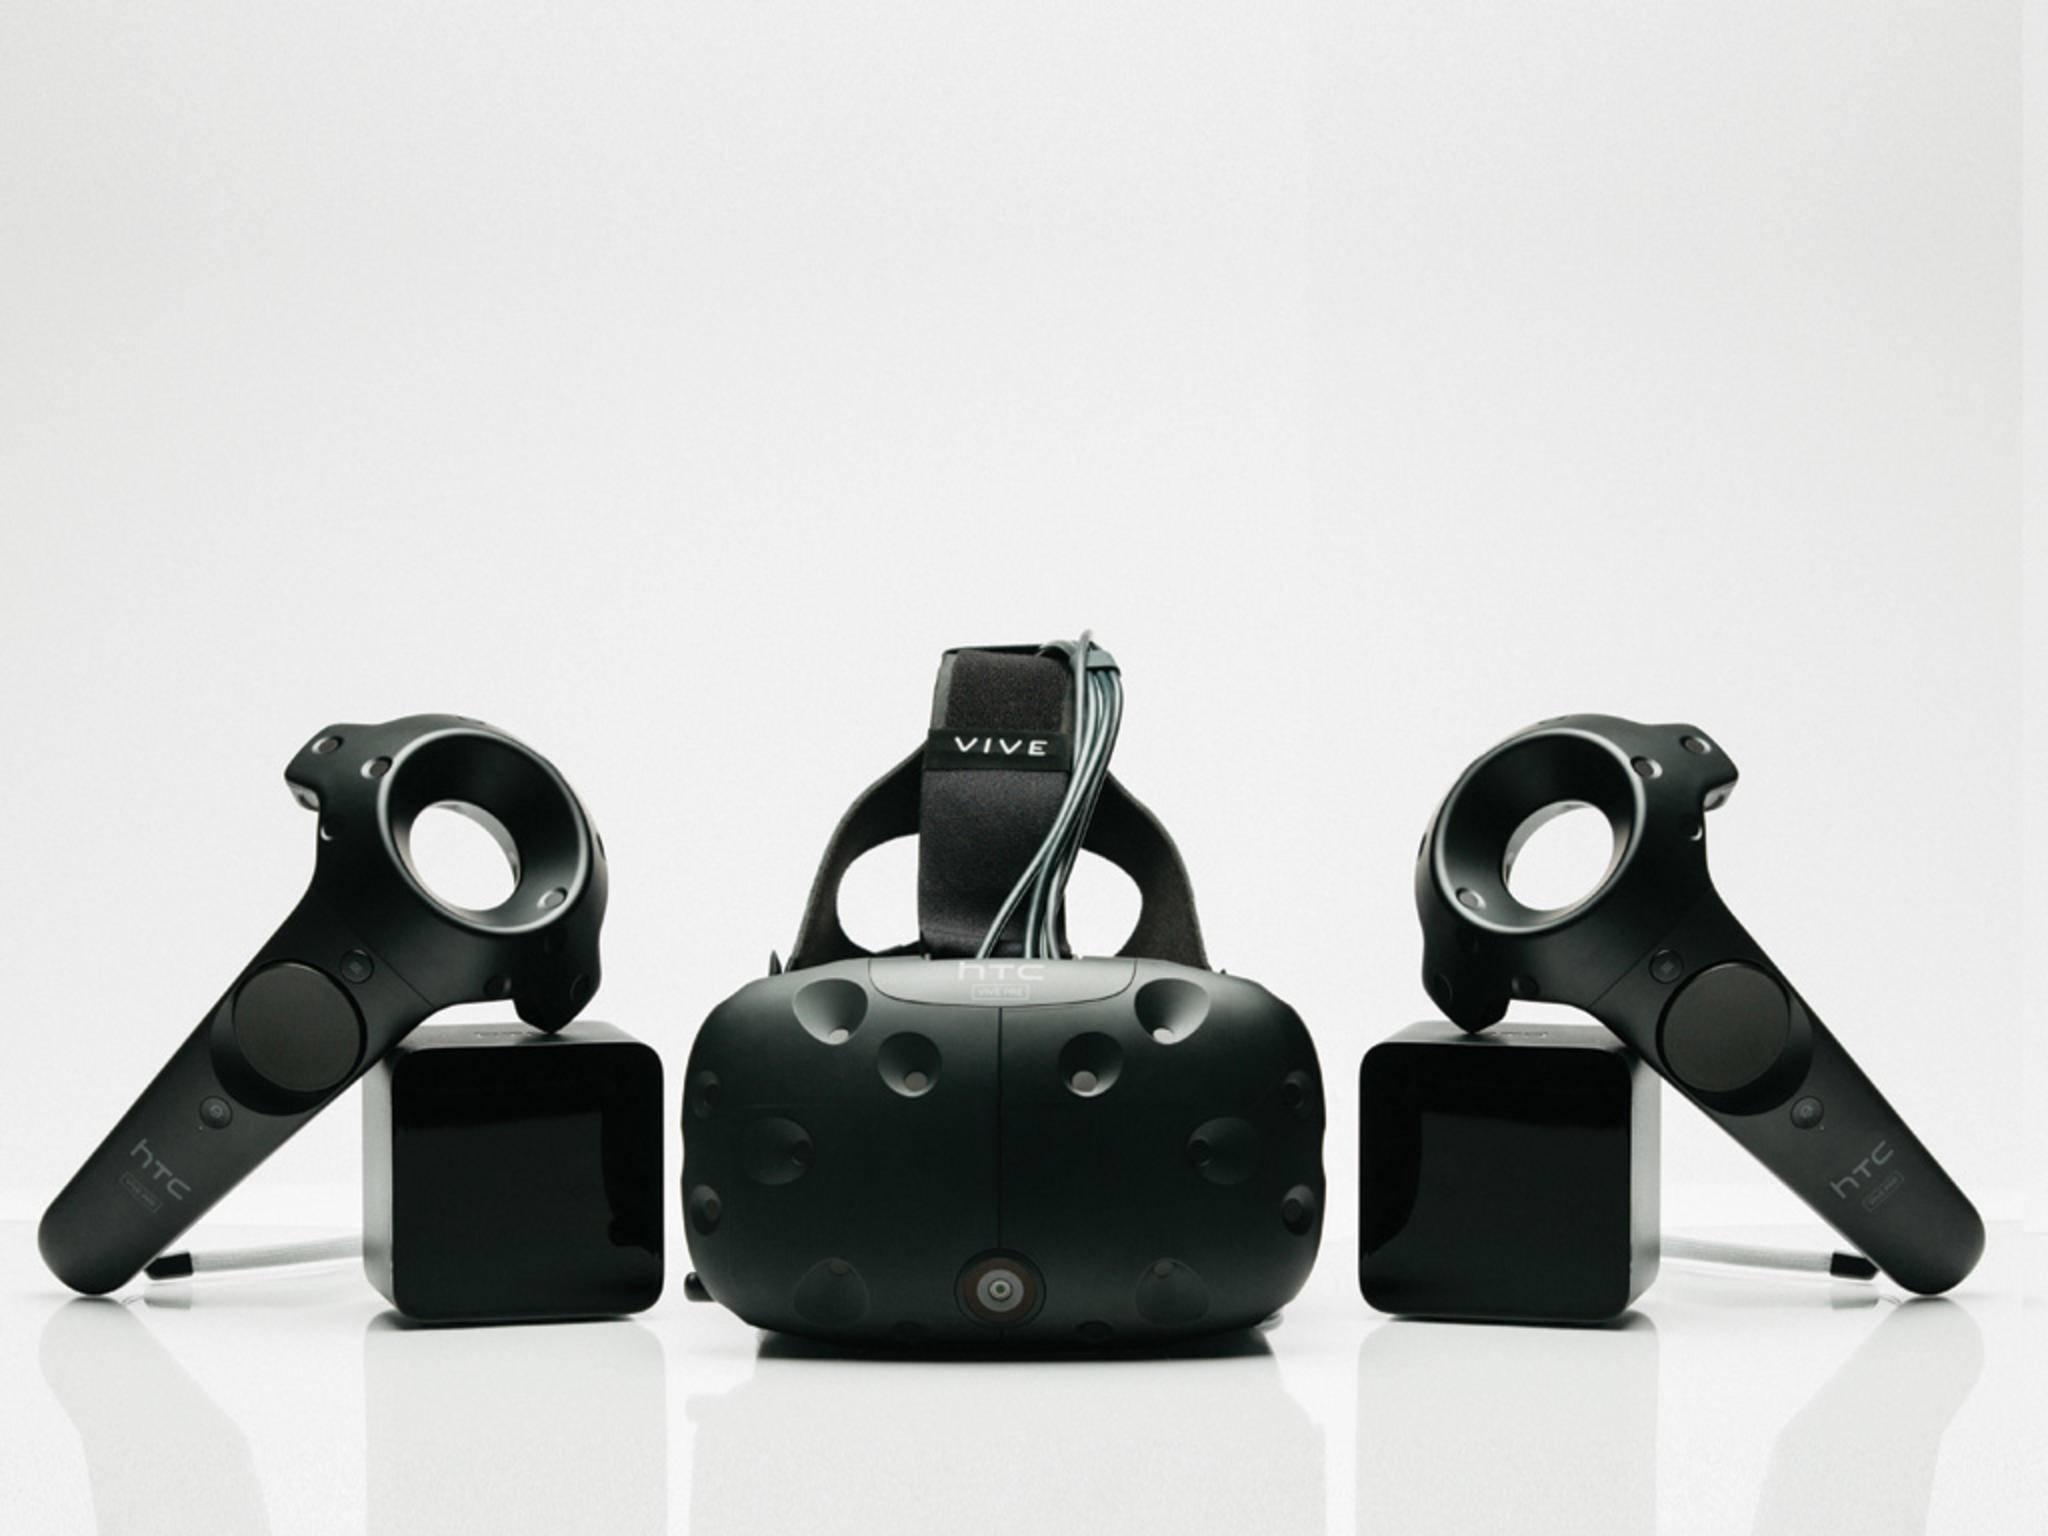 Die HTC Vive soll das ultimative VR-Erlebnis liefern.